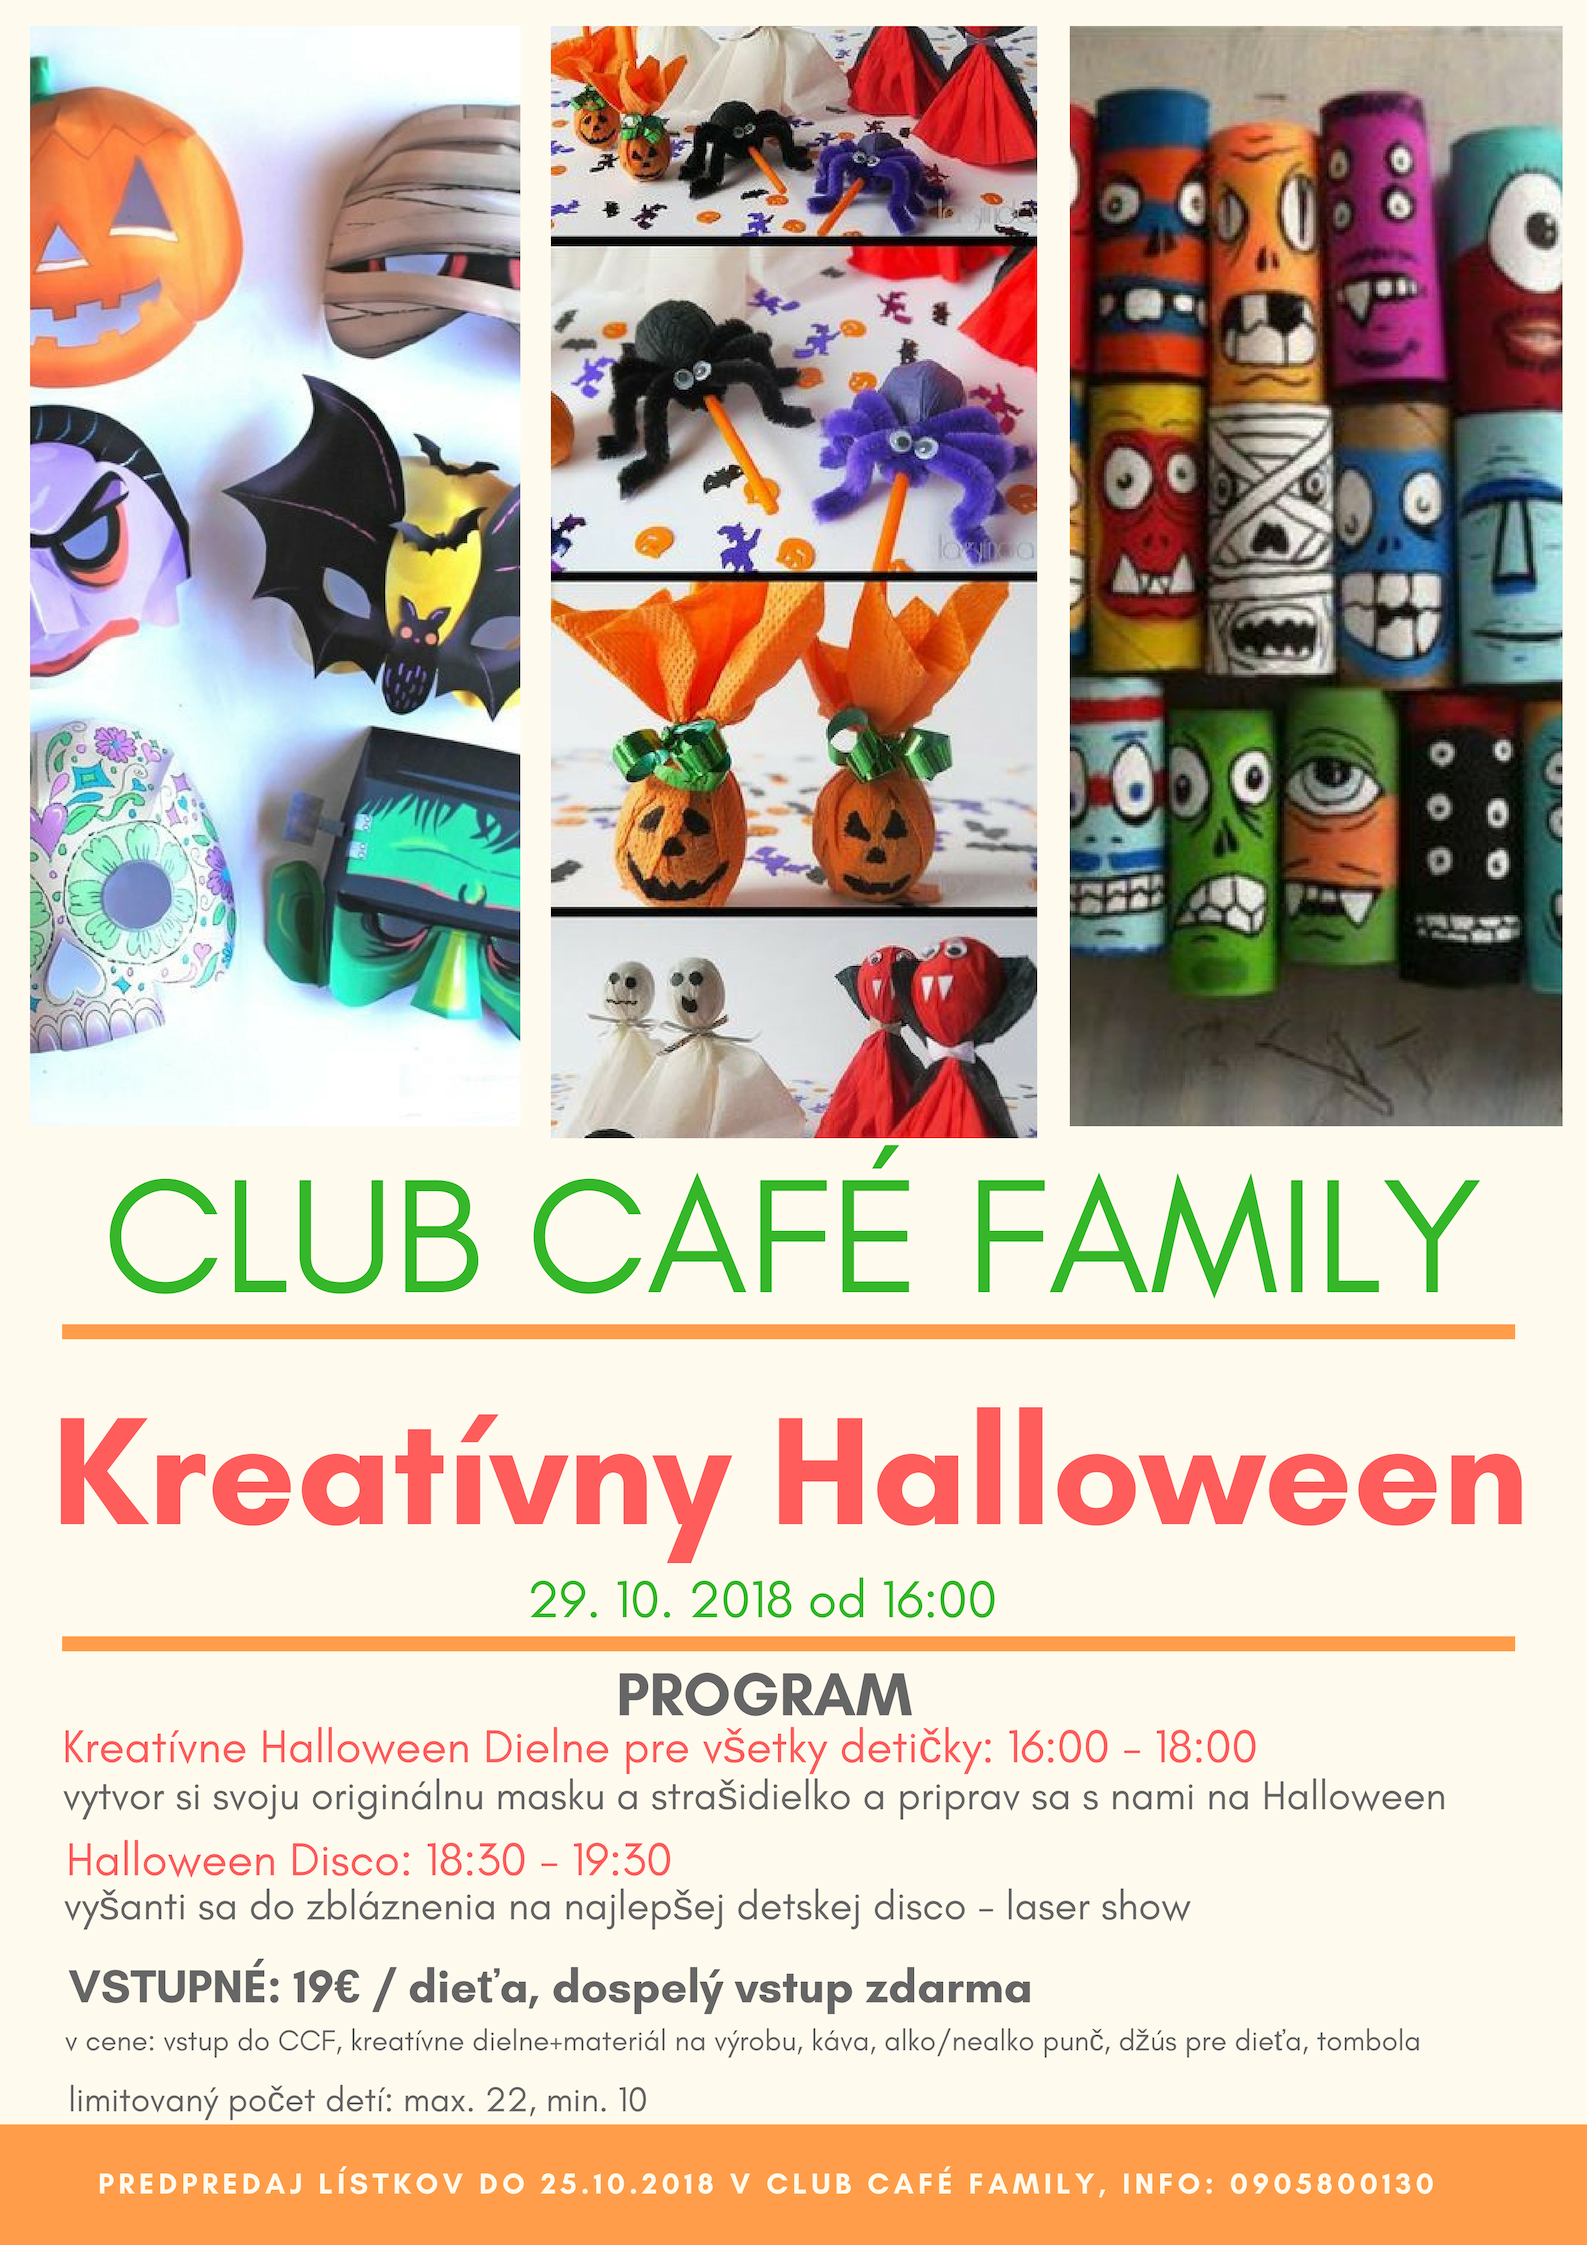 Kreatvny Halloweenjpg